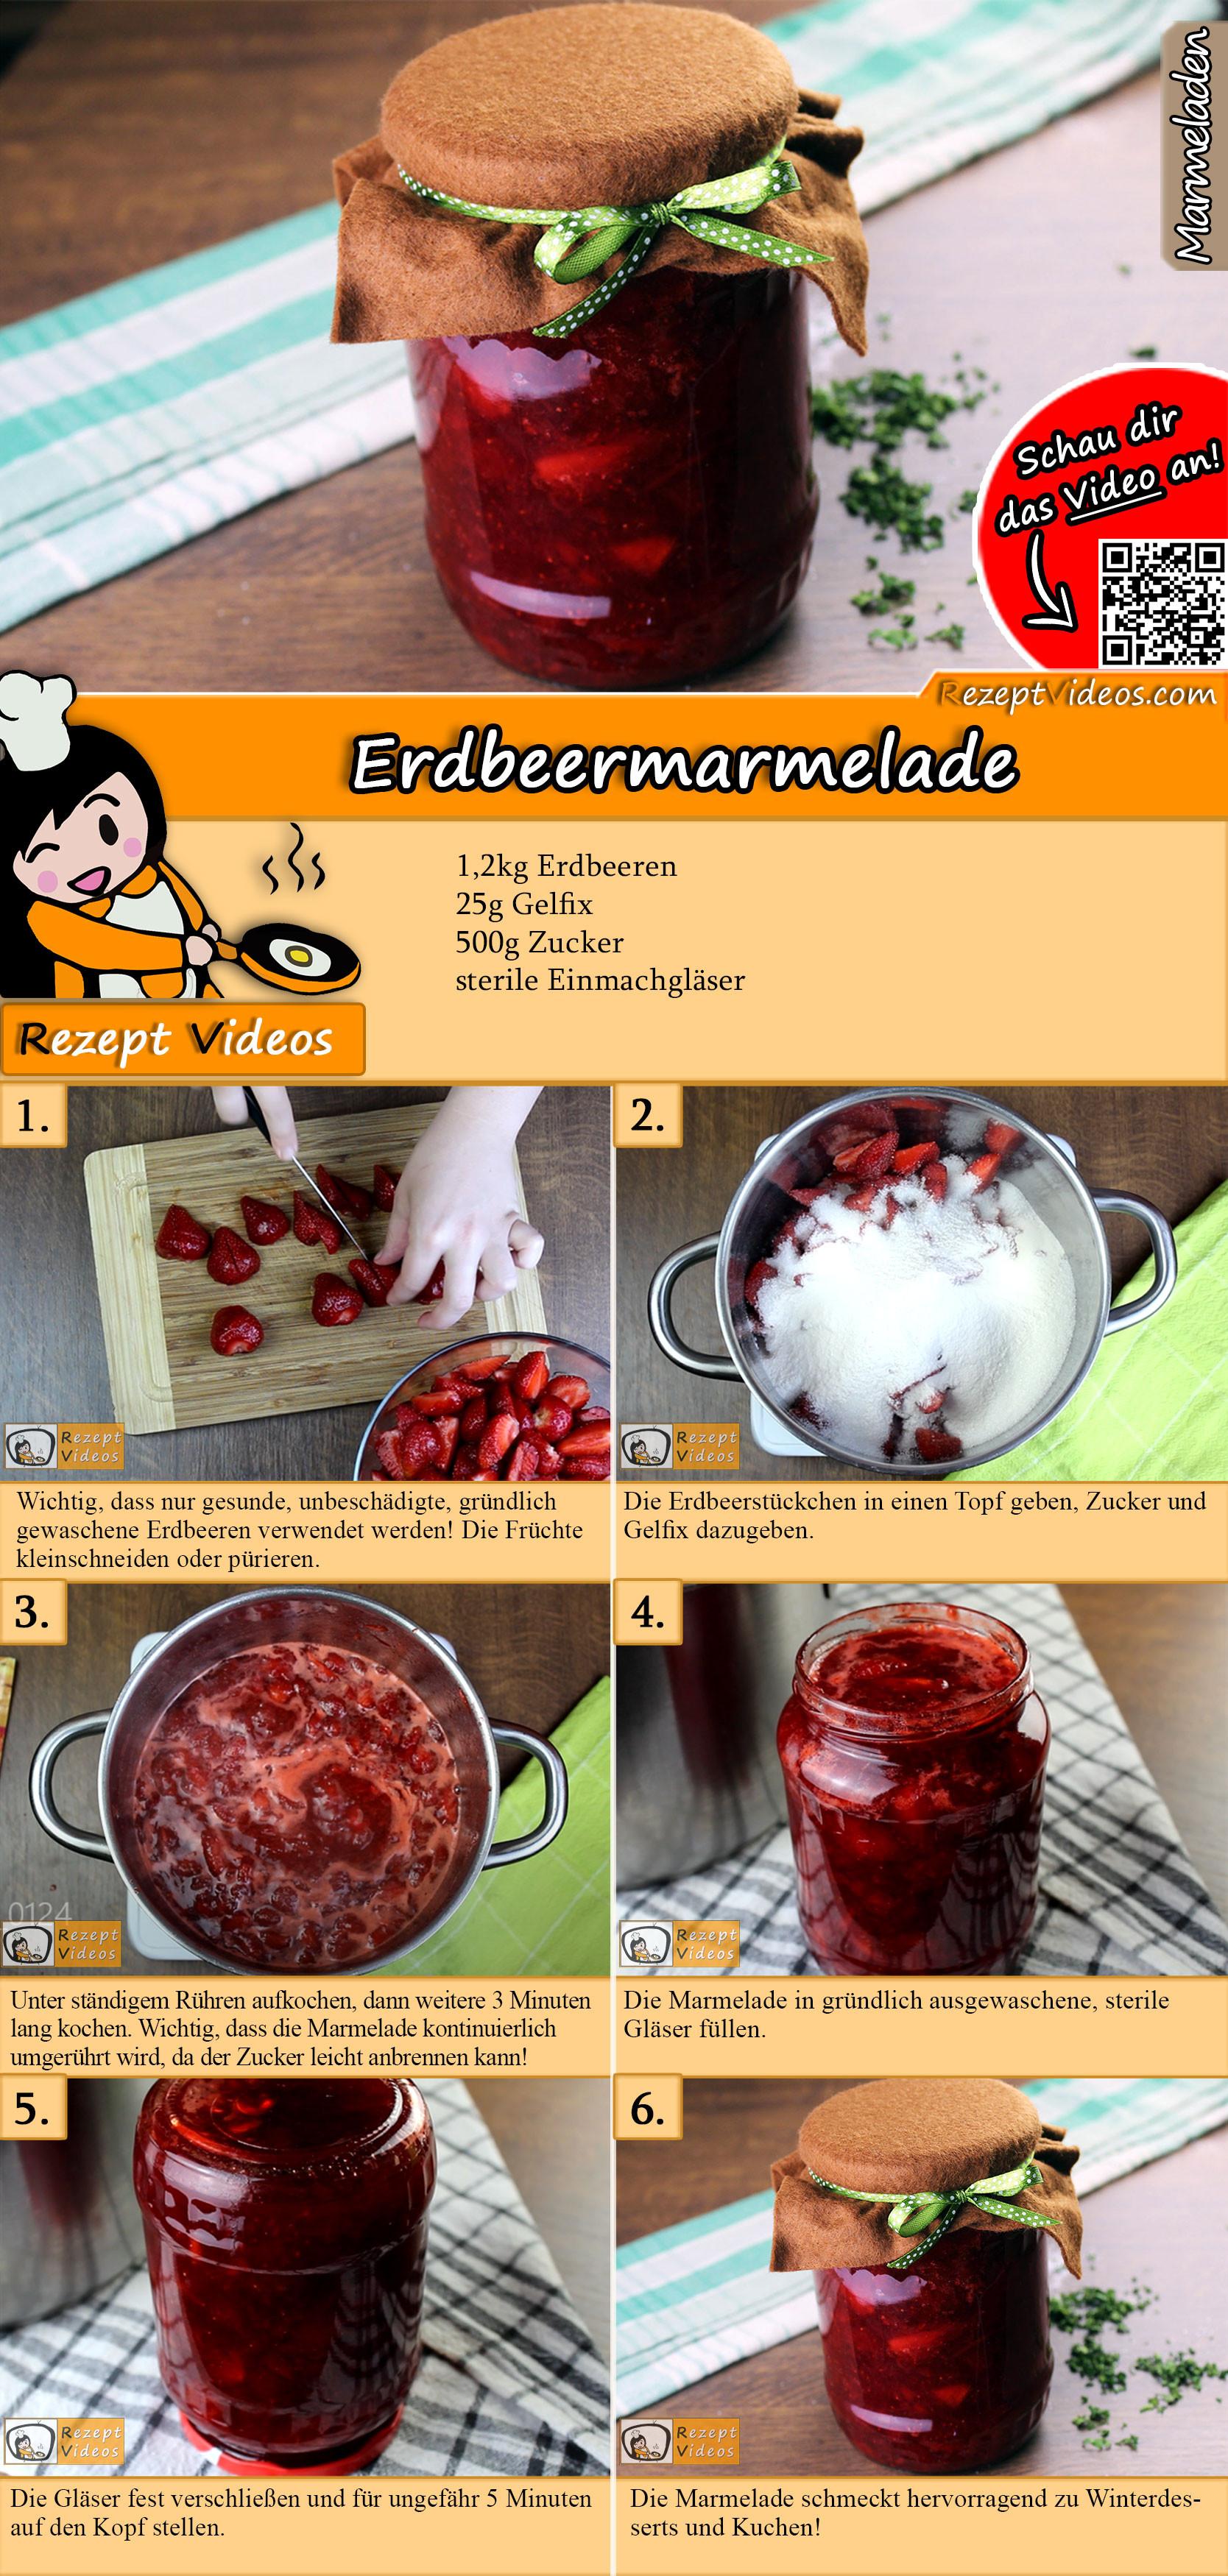 Erdbeermarmelade Rezept mit Video